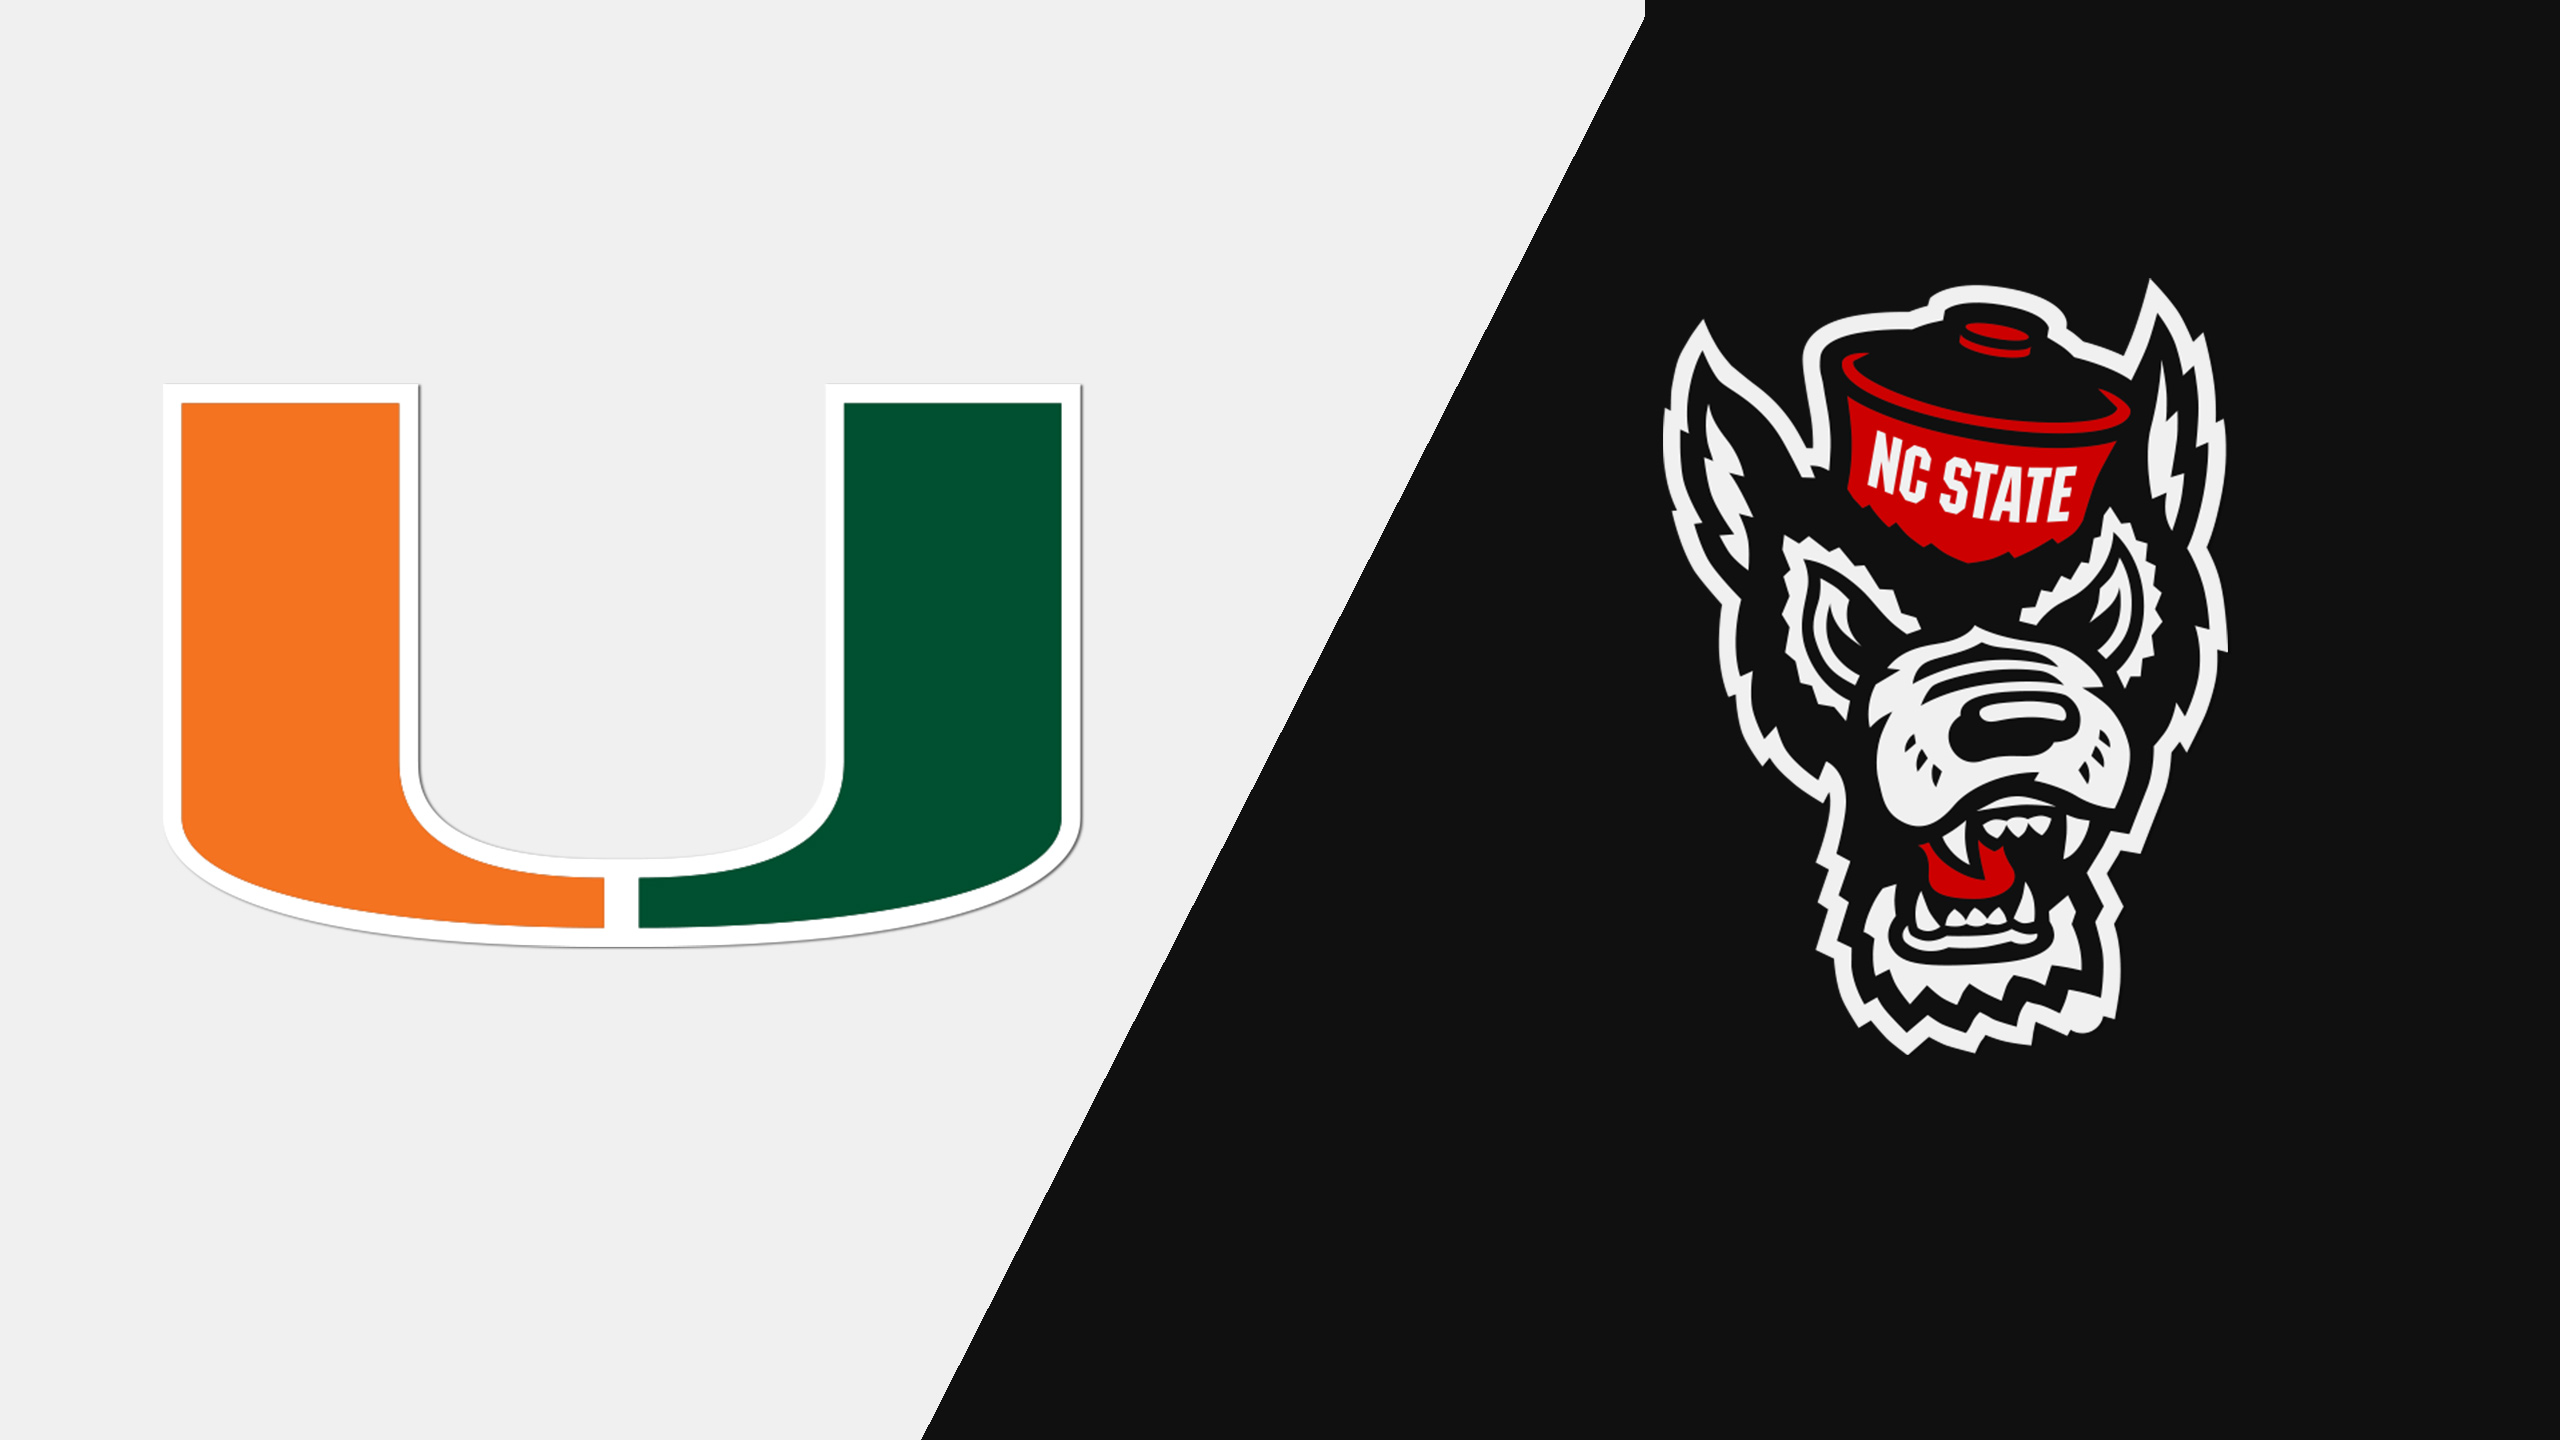 Miami (FL) vs. NC State (W Soccer)